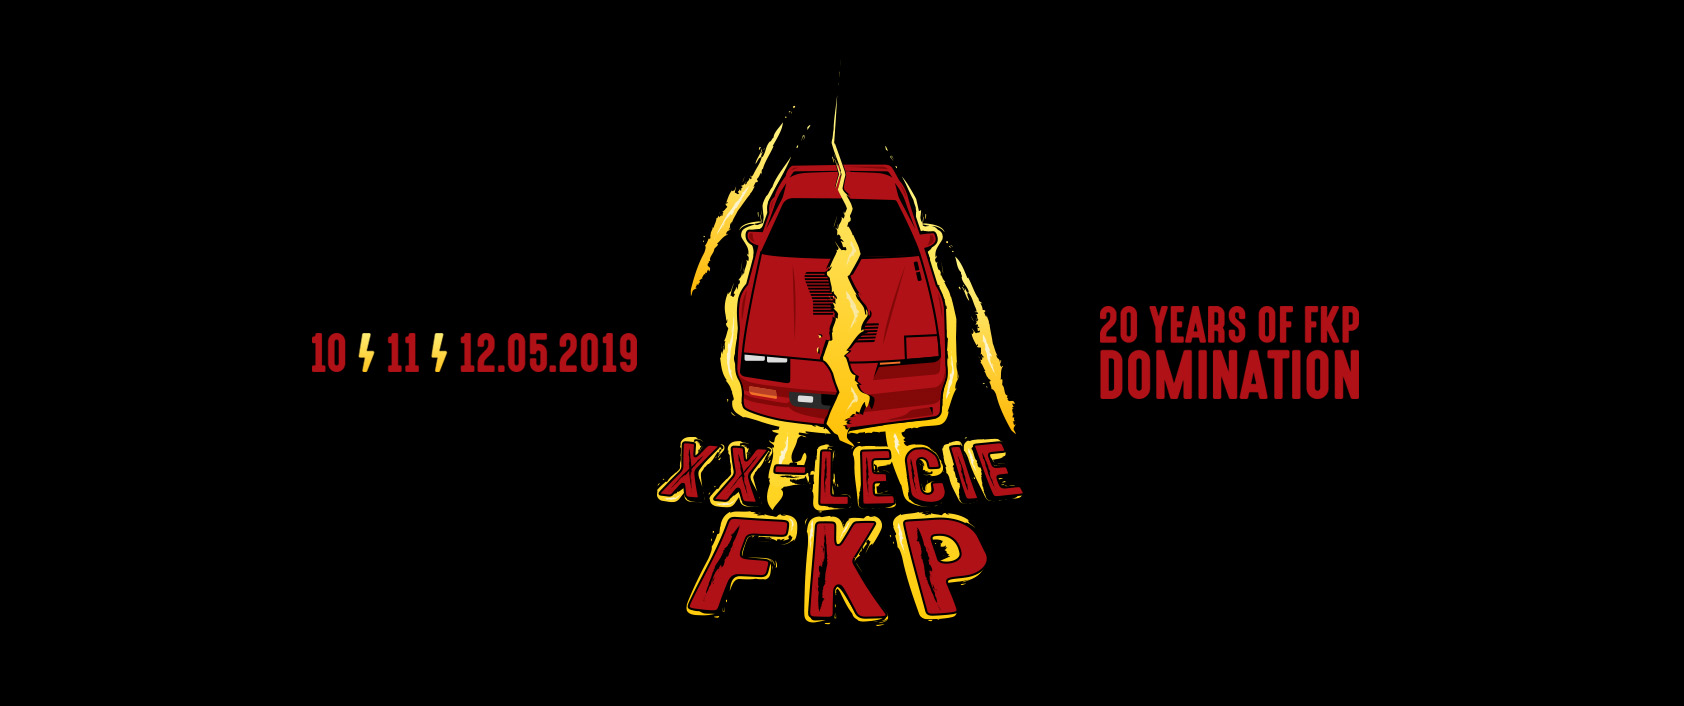 Klasy podczas XX-lecia FKP 2019